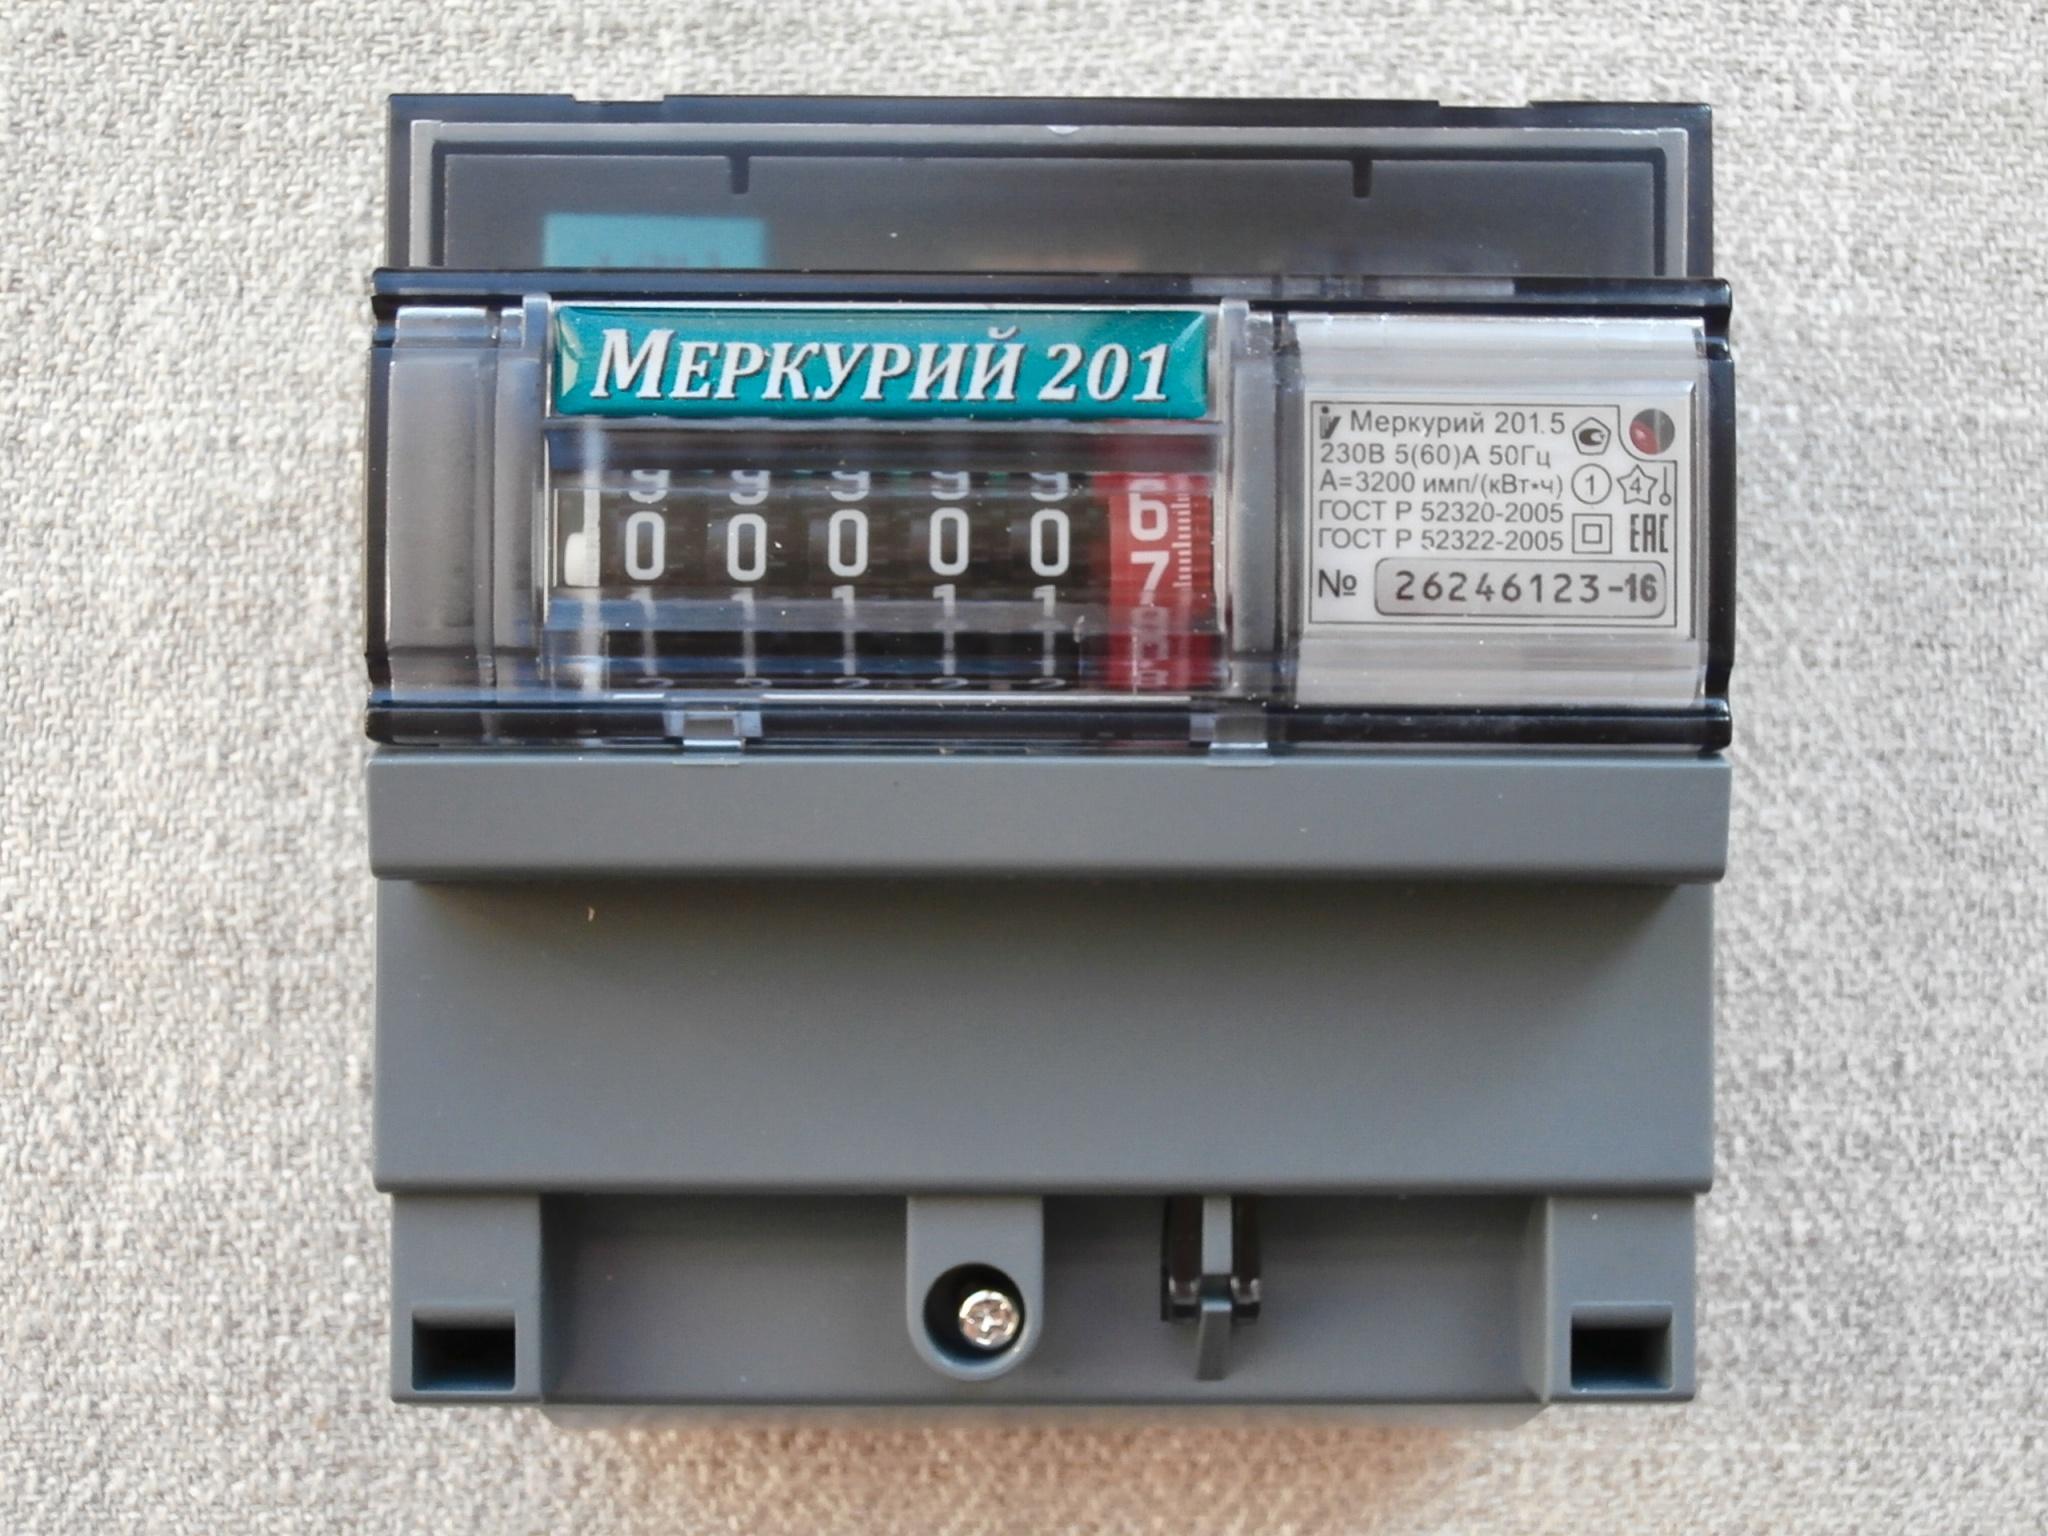 Электросчётчик меркурий 201: схема подключения, характеристики и показания